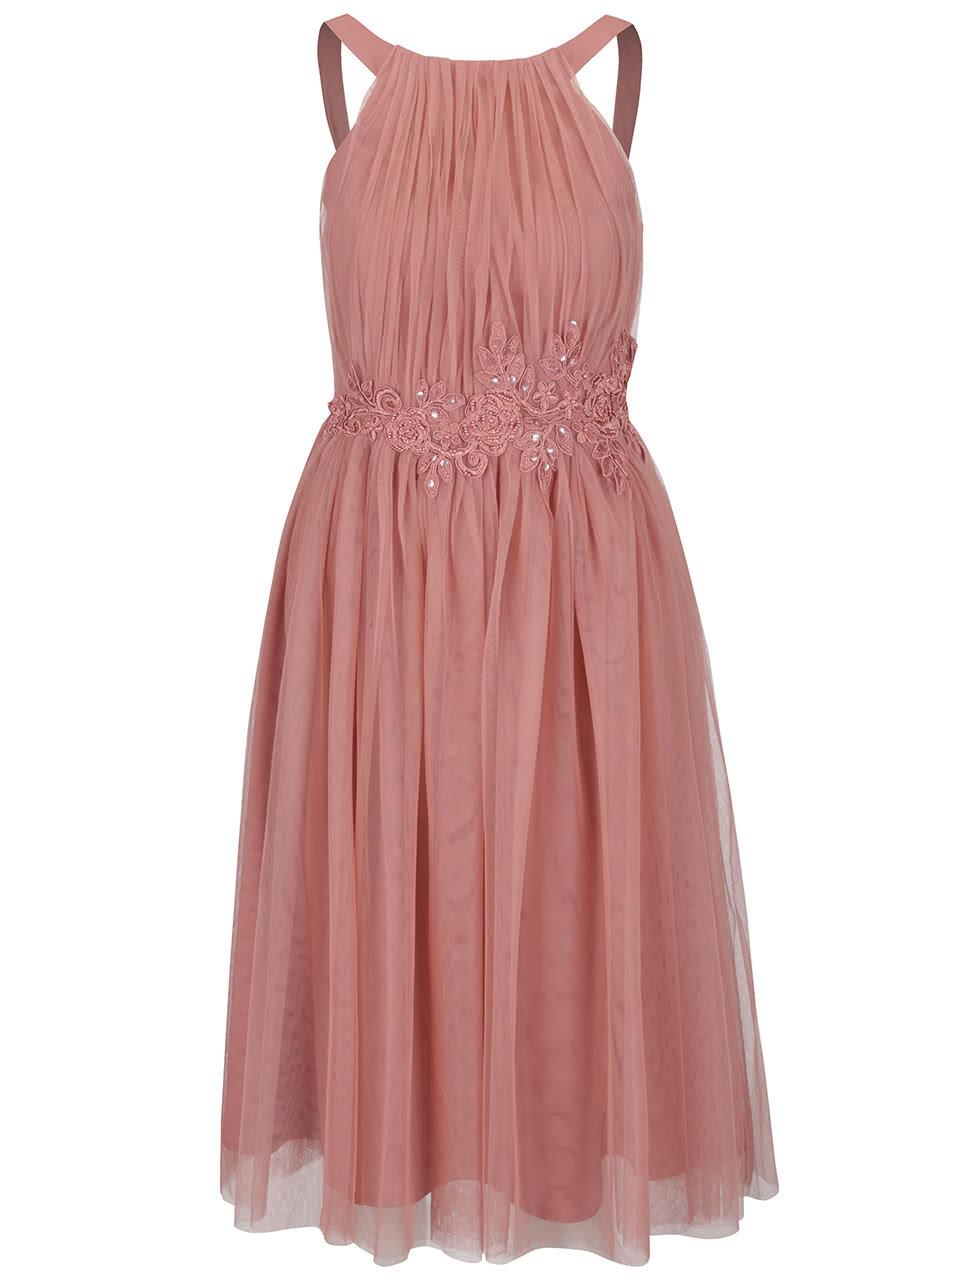 Svetloružové tylové midi šaty s kvetovanou aplikáciou Little Mistress ... c4eed9a190f